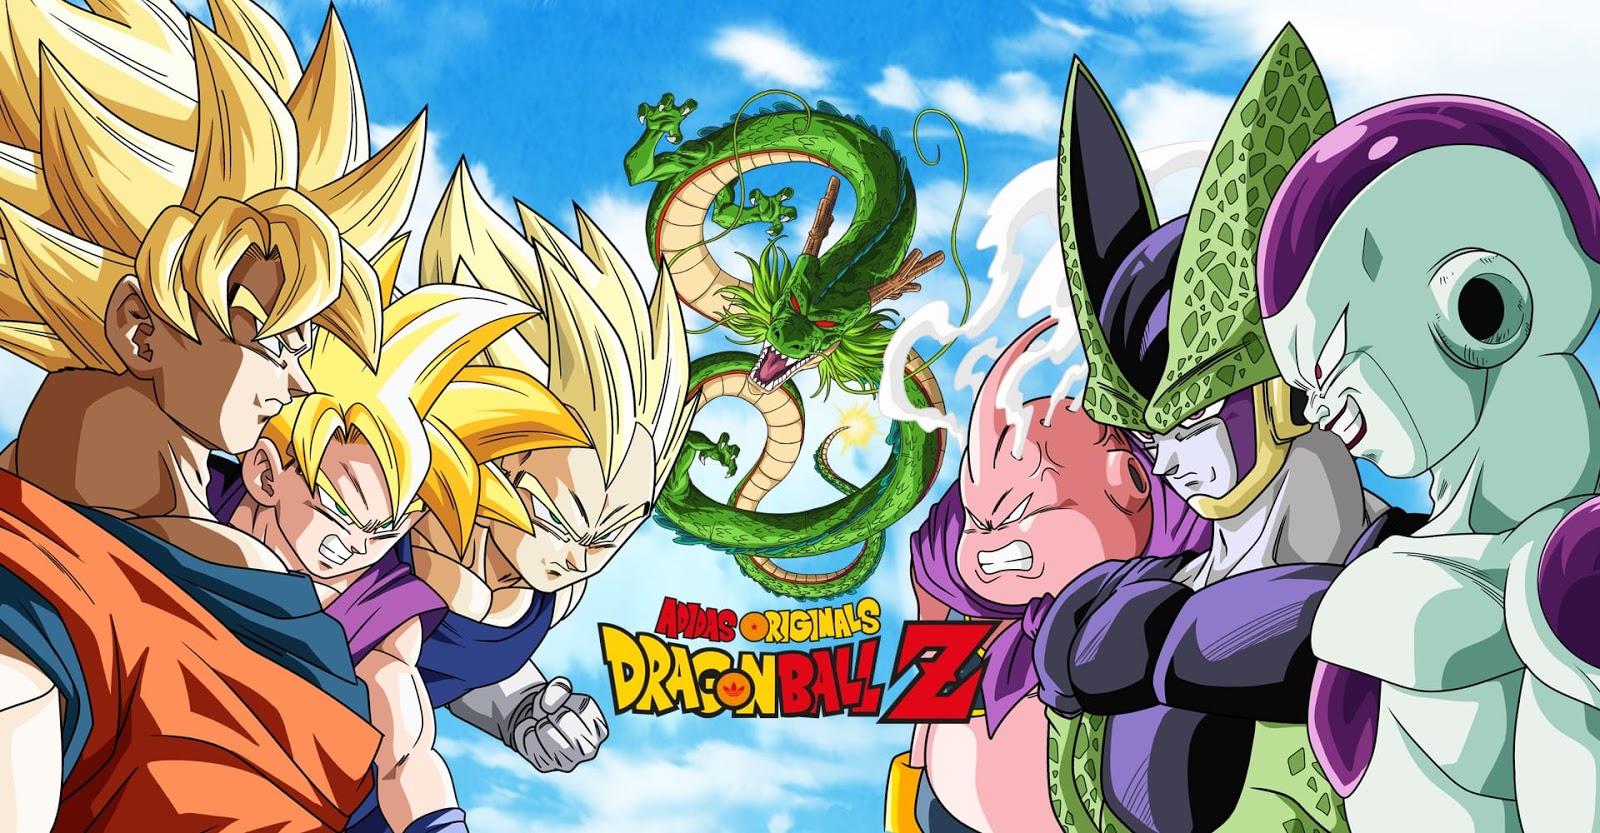 dragon ball z episodes download english free